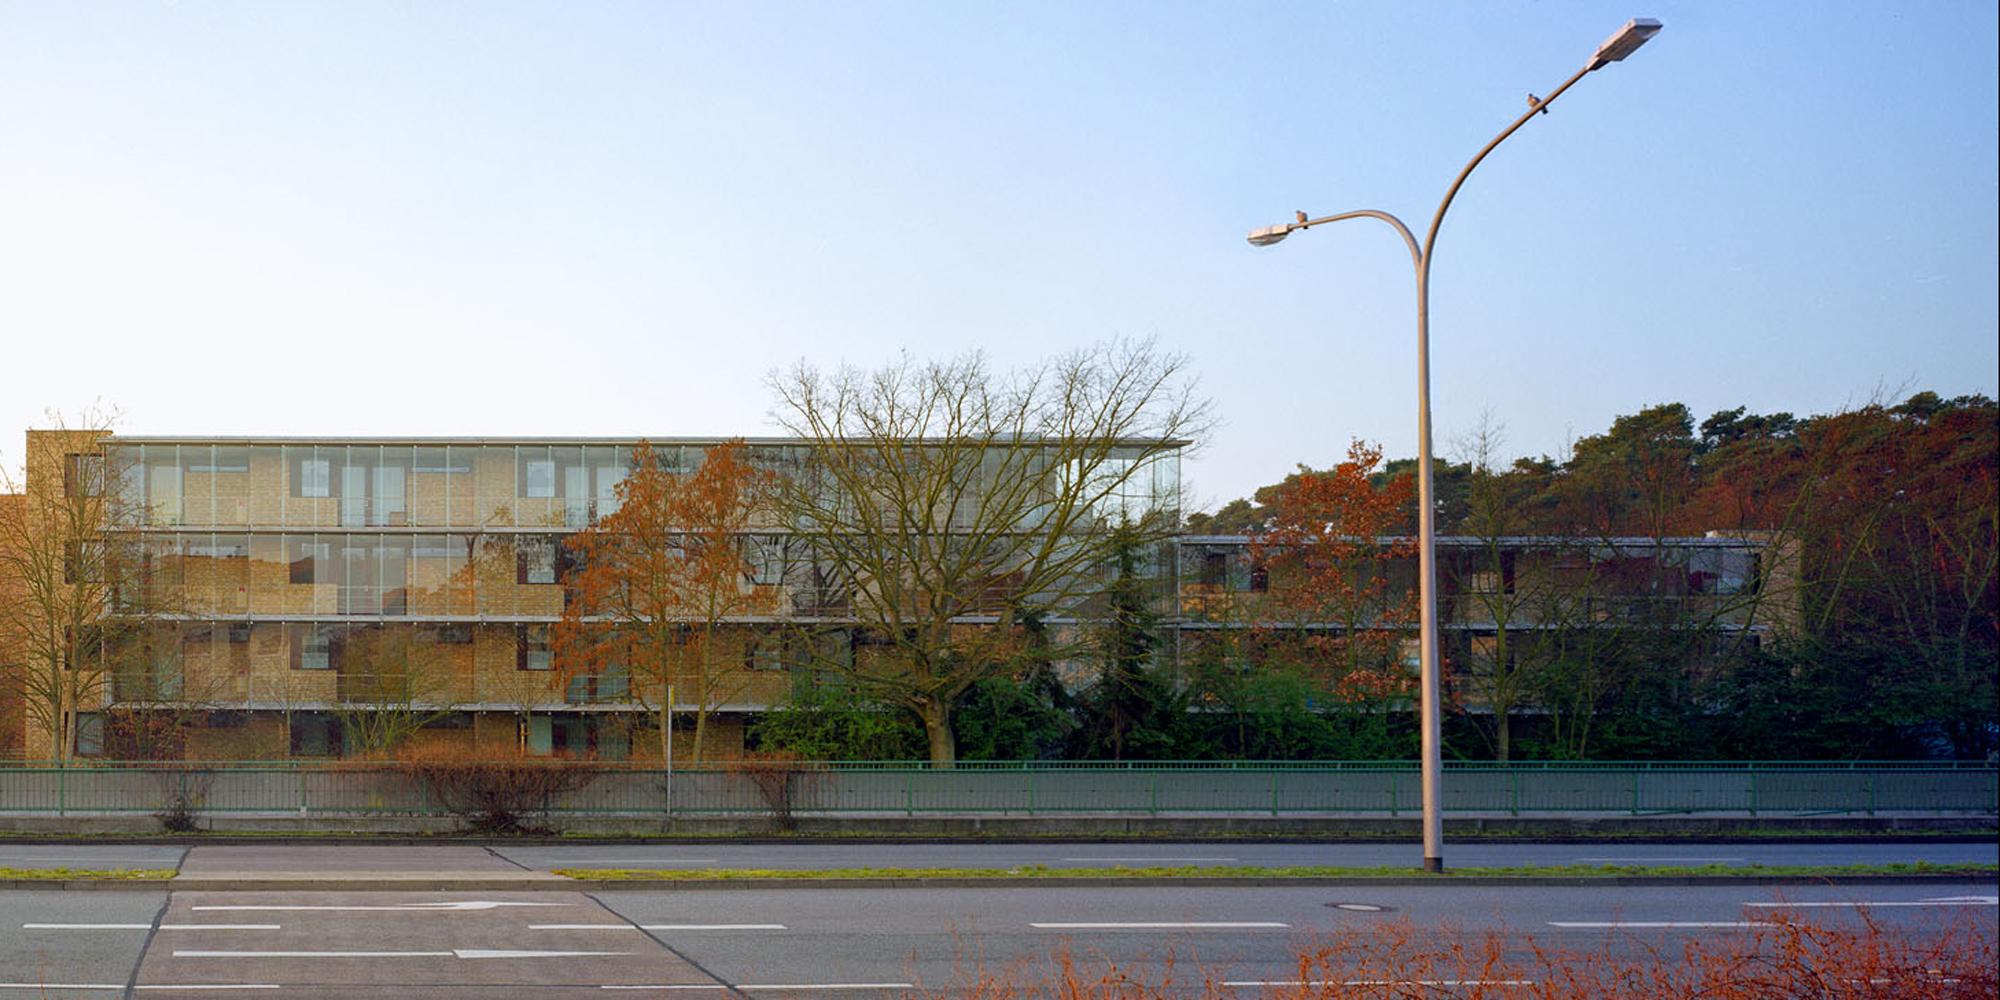 Betreutes Wohnen am Ostpark